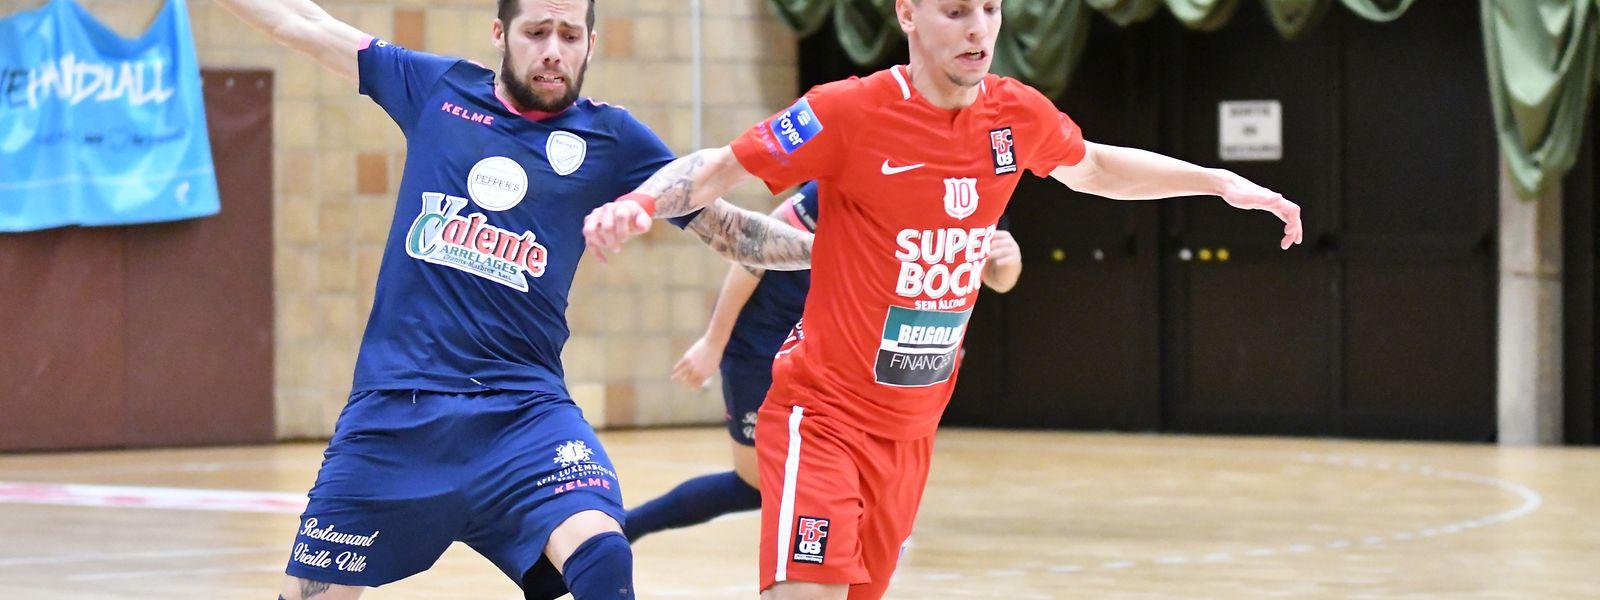 FC Differdange e Racing Luxembourg são os maiores candidatos ao título.